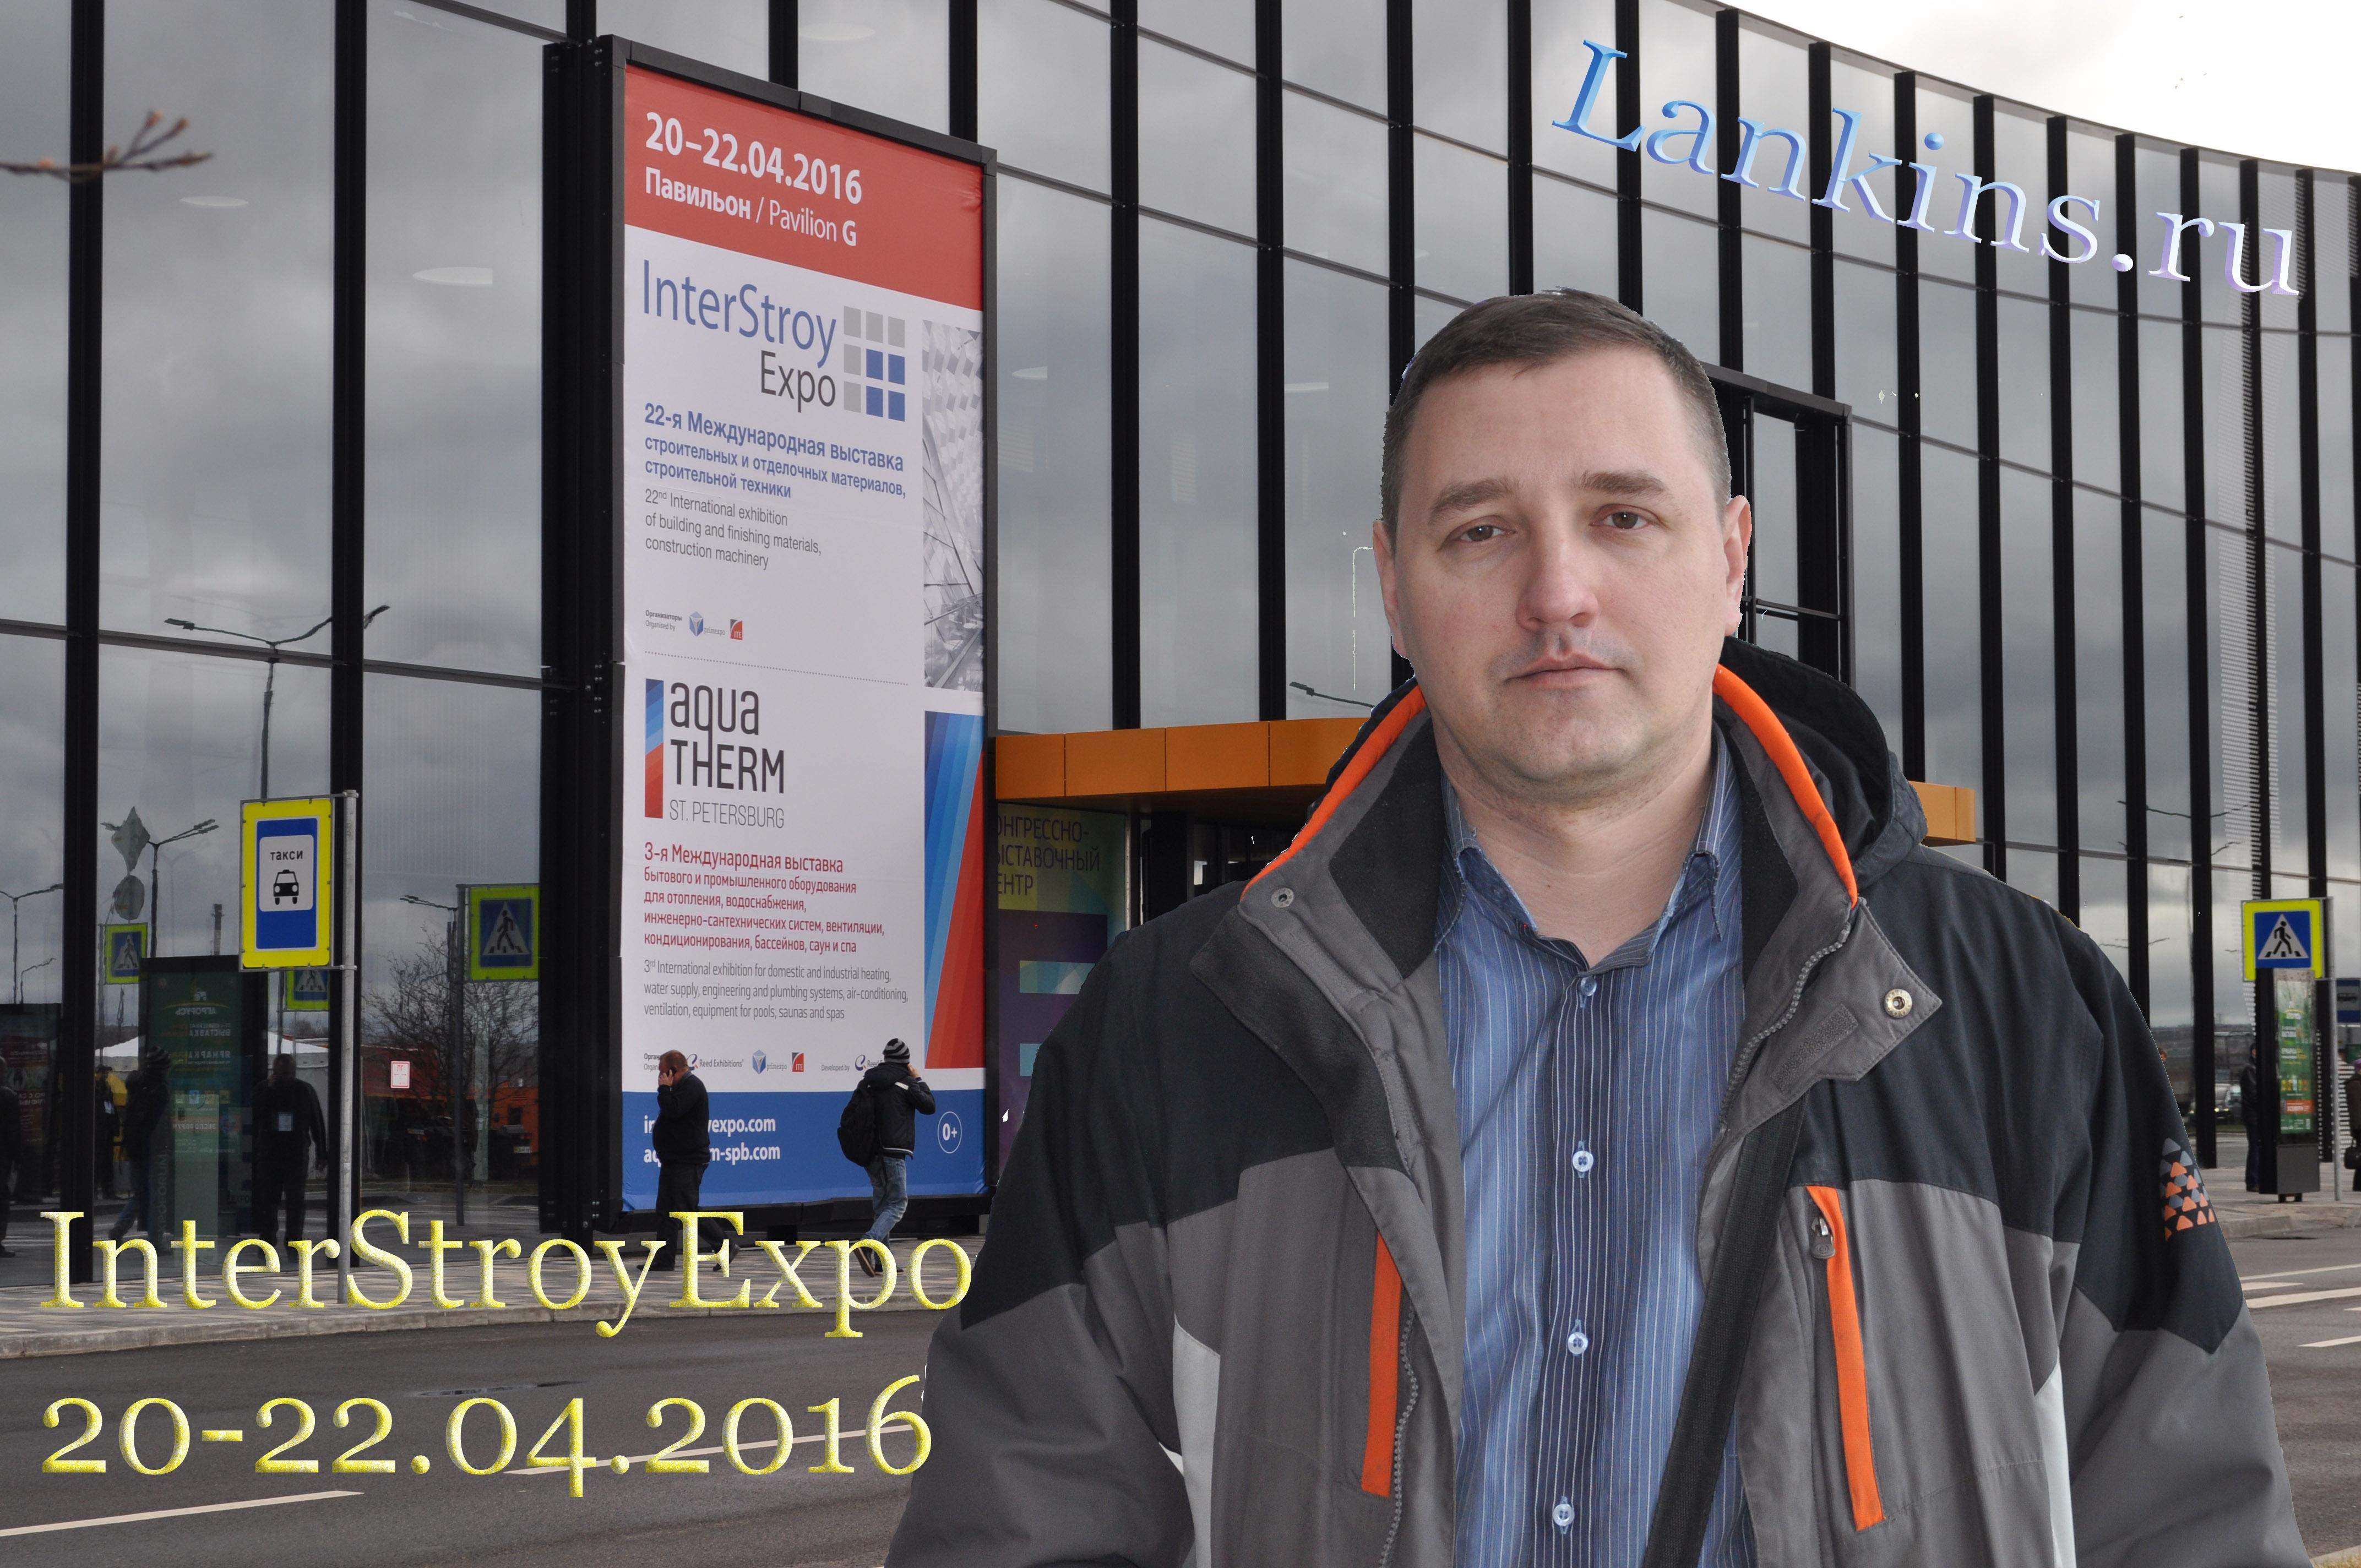 stroitel'naja-vystavka-interstrojjekspo-строительная-выставка-интерстройэкспо